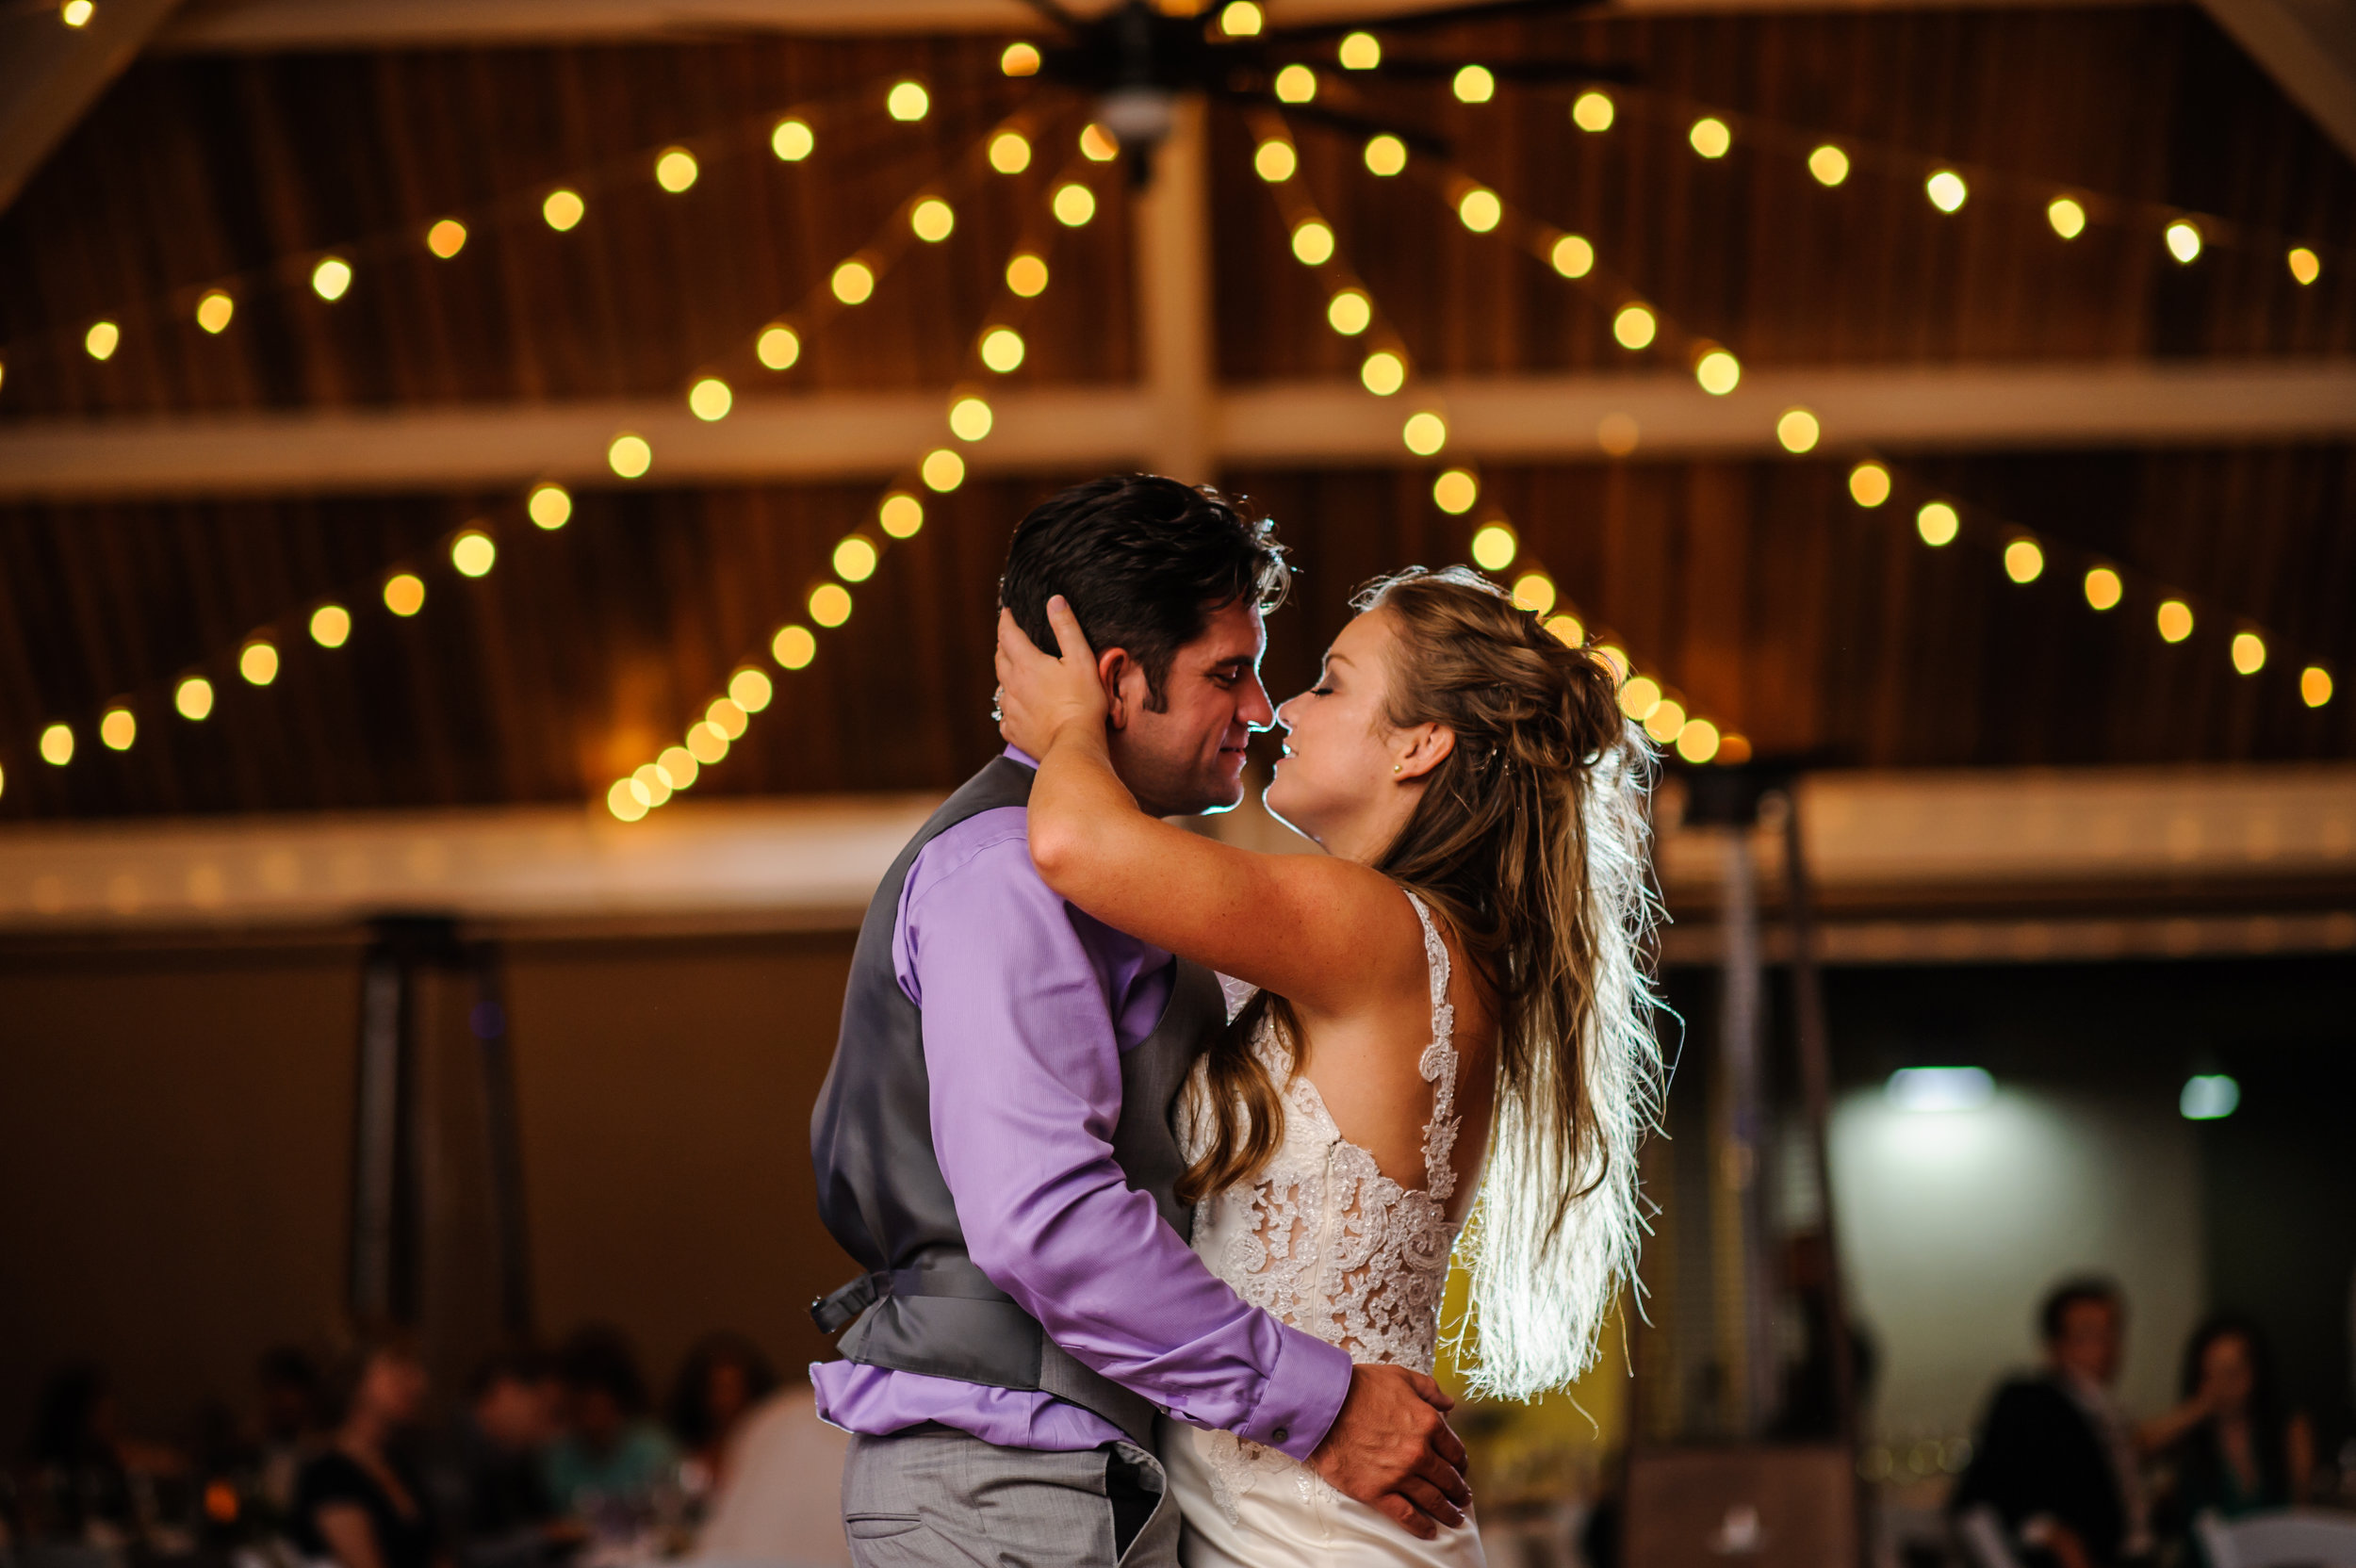 becca-jacob-041-tenaya-lodge-yosemite-wedding-photographer-katherine-nicole-photography.JPG